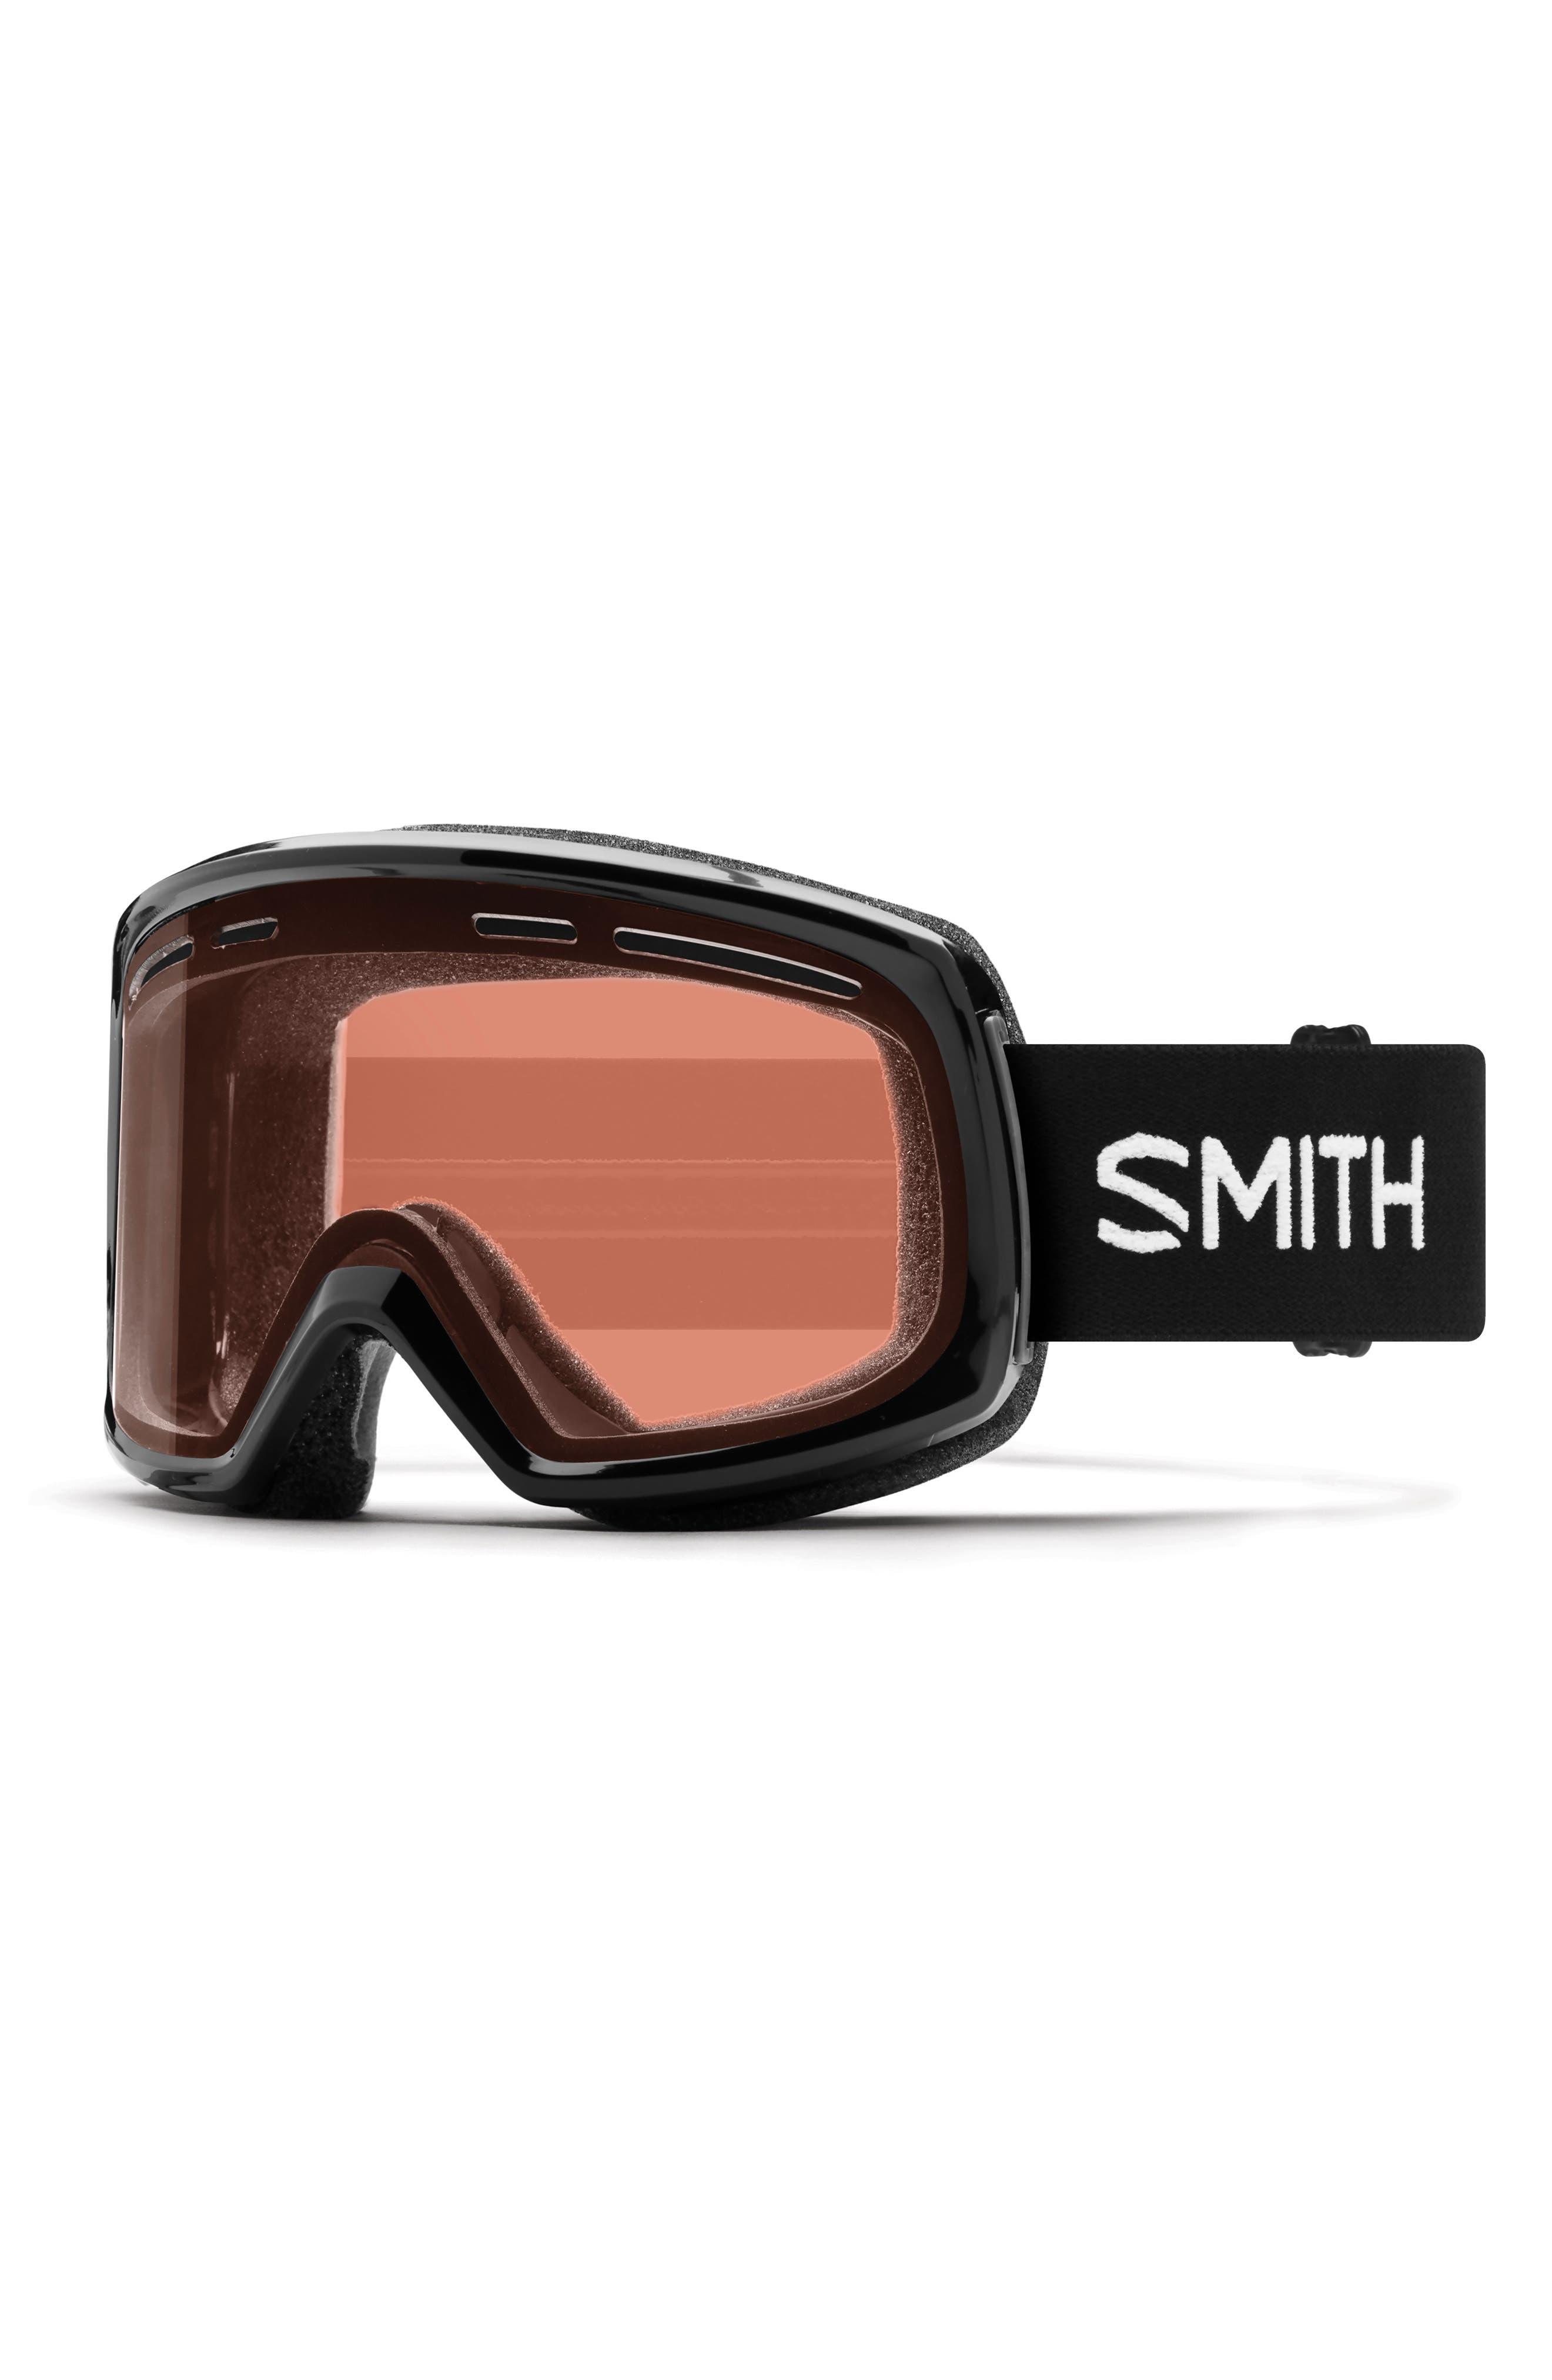 Range Snow Goggles,                         Main,                         color, BLACK